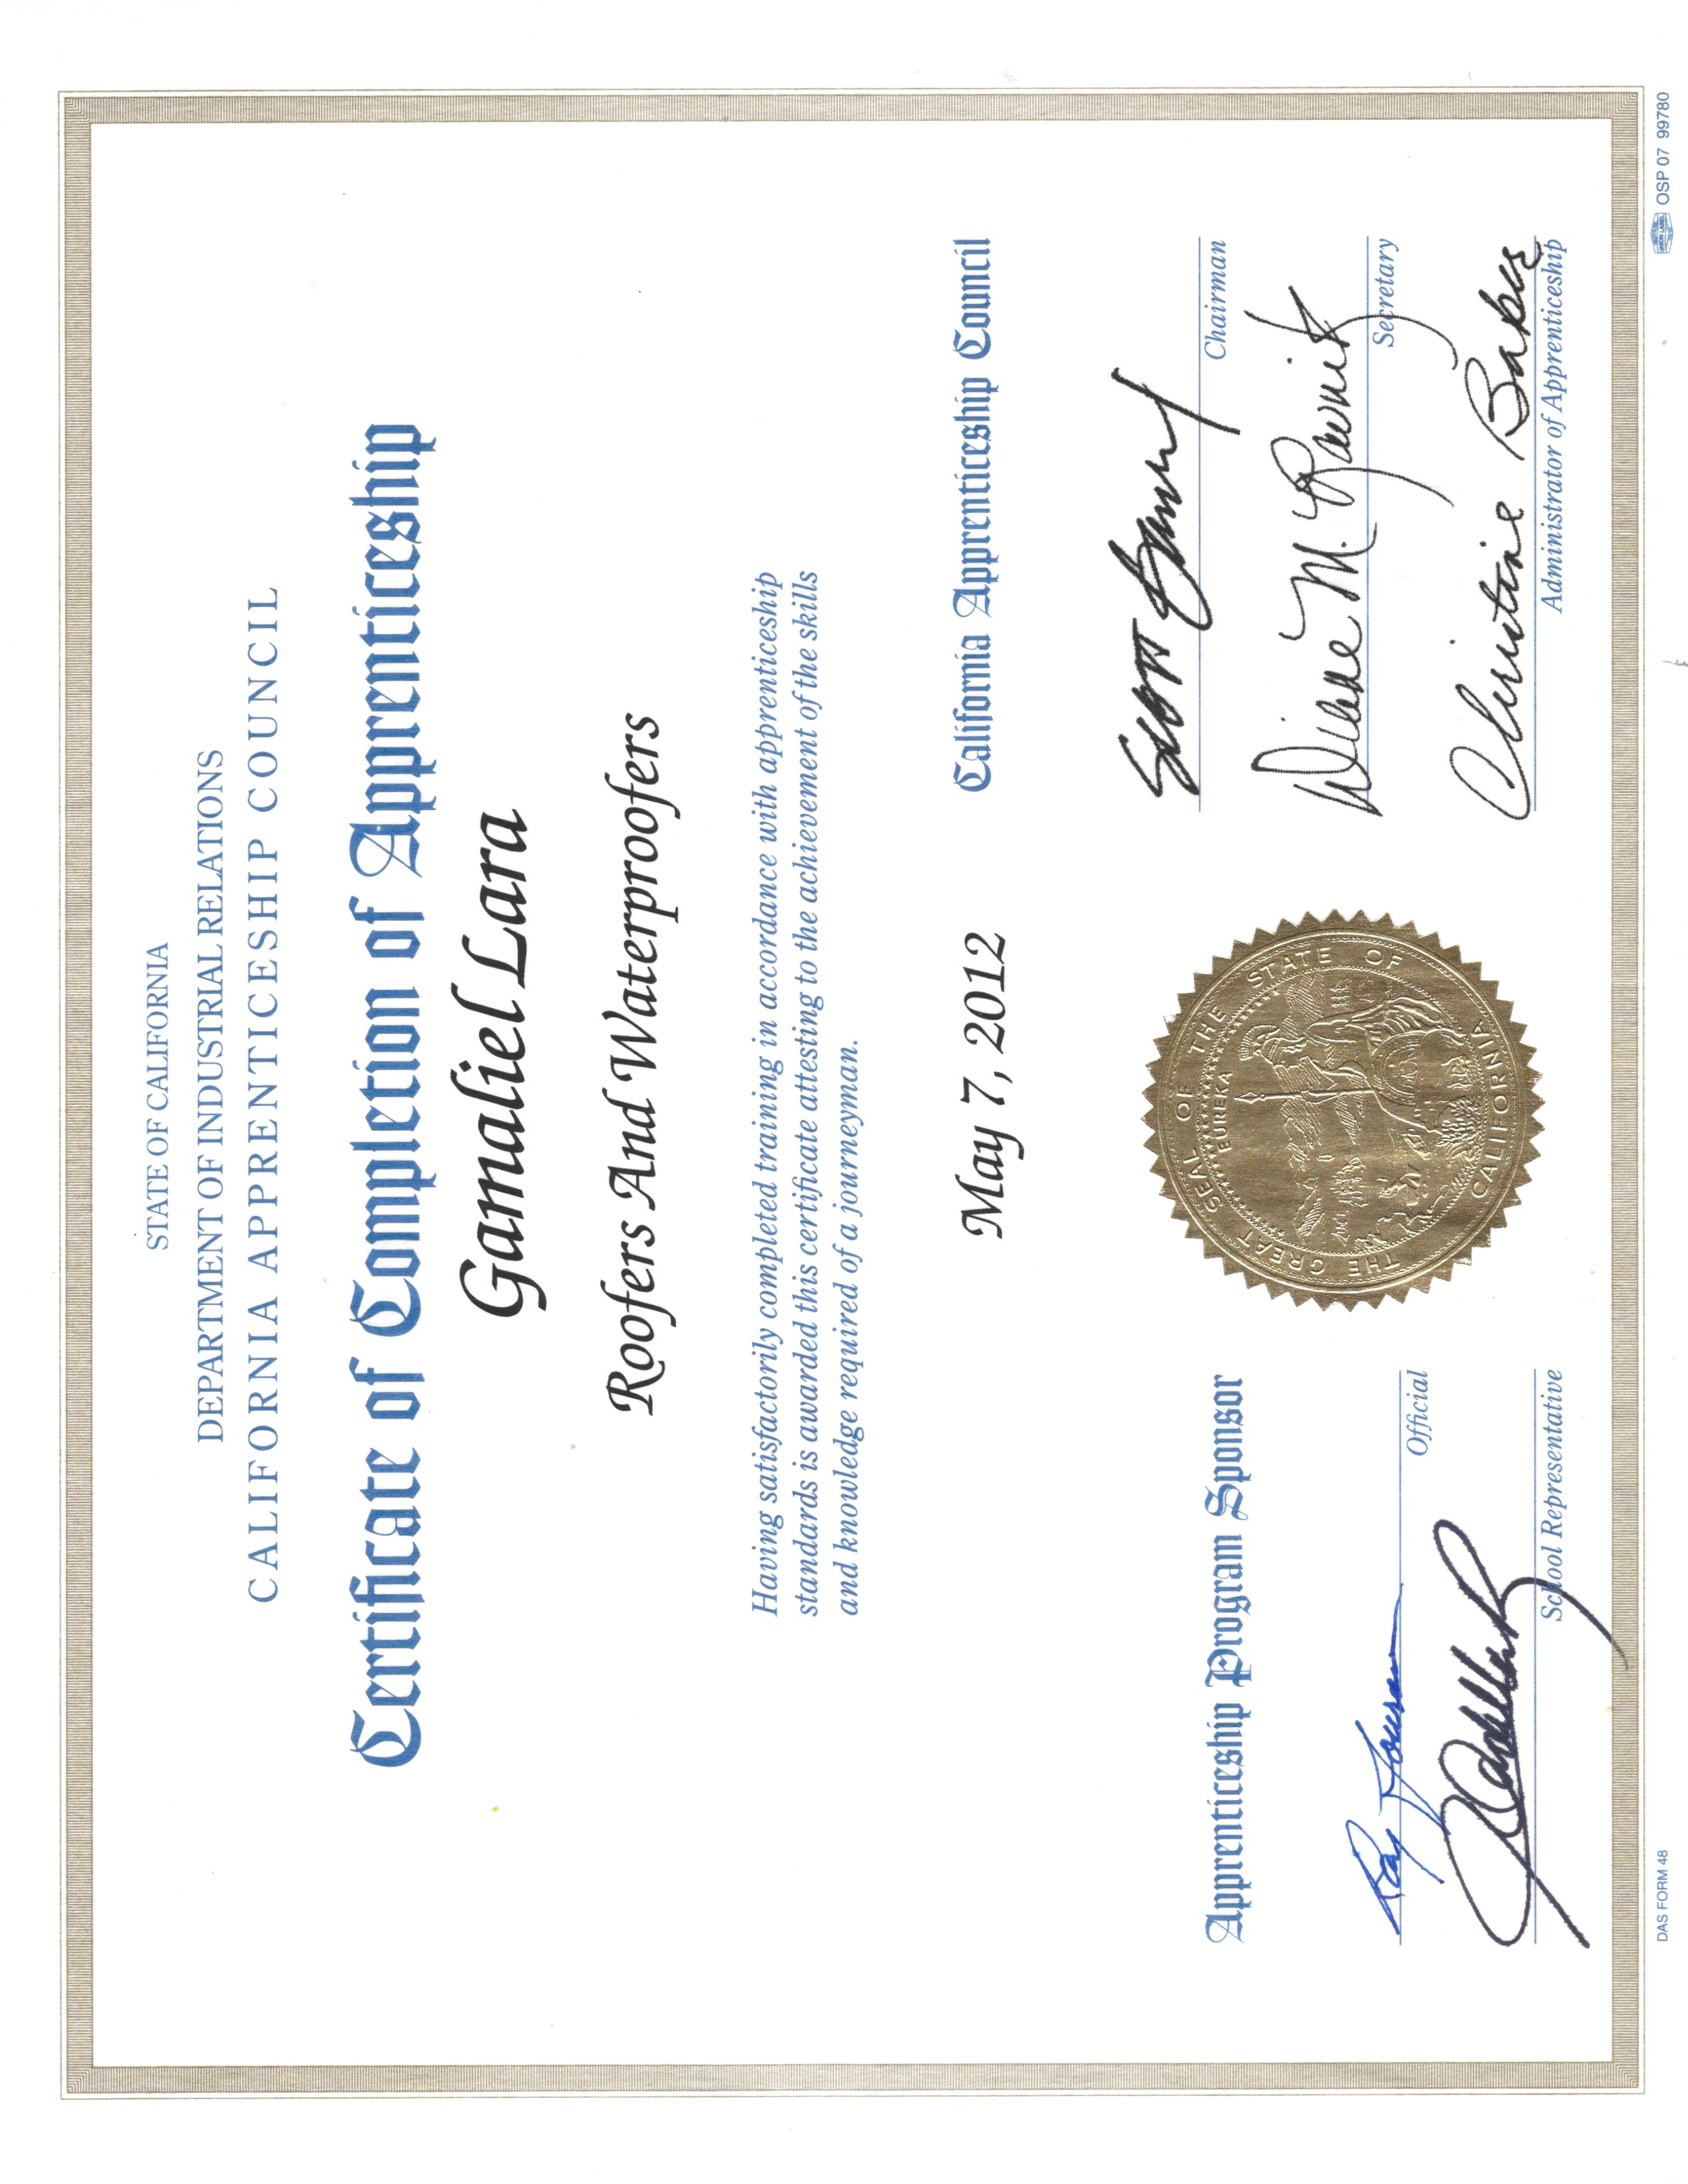 Kbc roofing waterproofing gamlara99yahoo licenses certification 1betcityfo Images